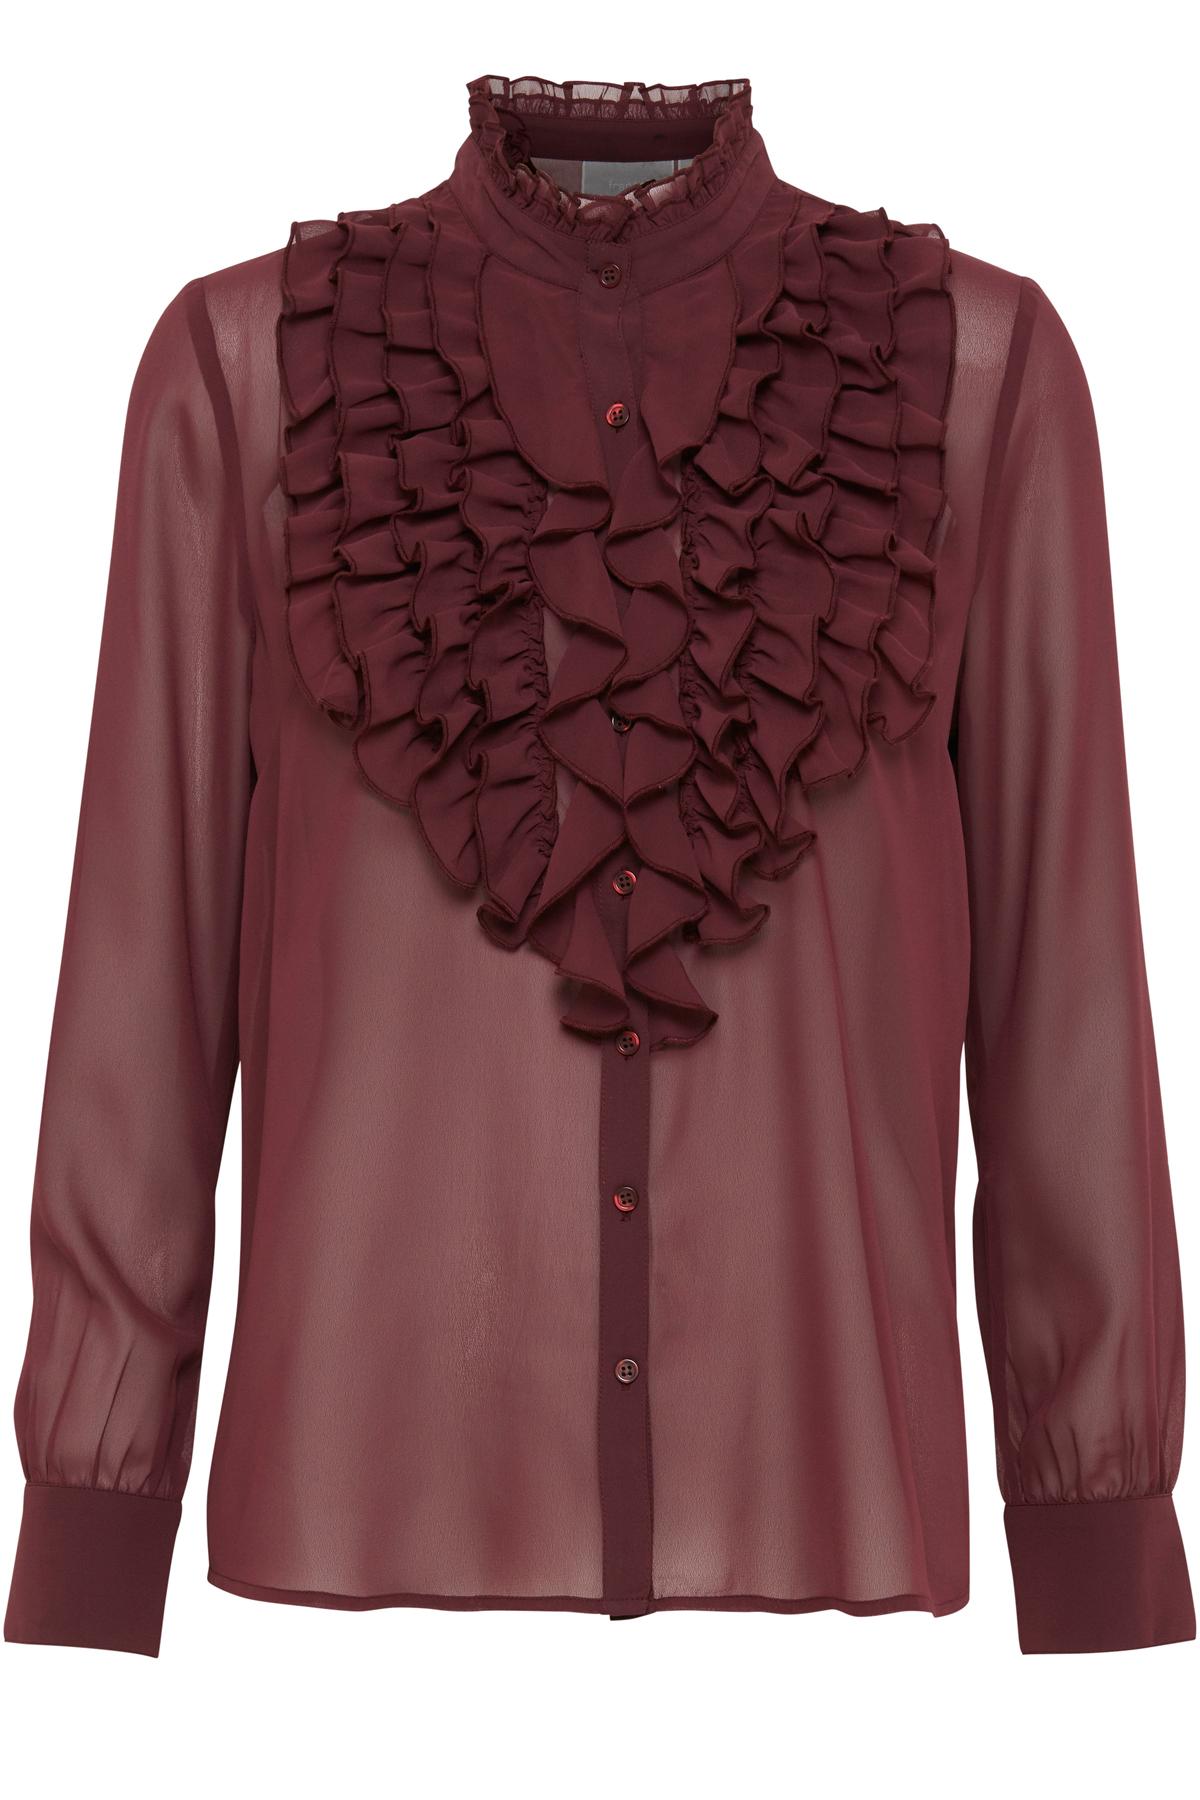 Image of Fransa Dame Langærmet skjorte - Bordeaux